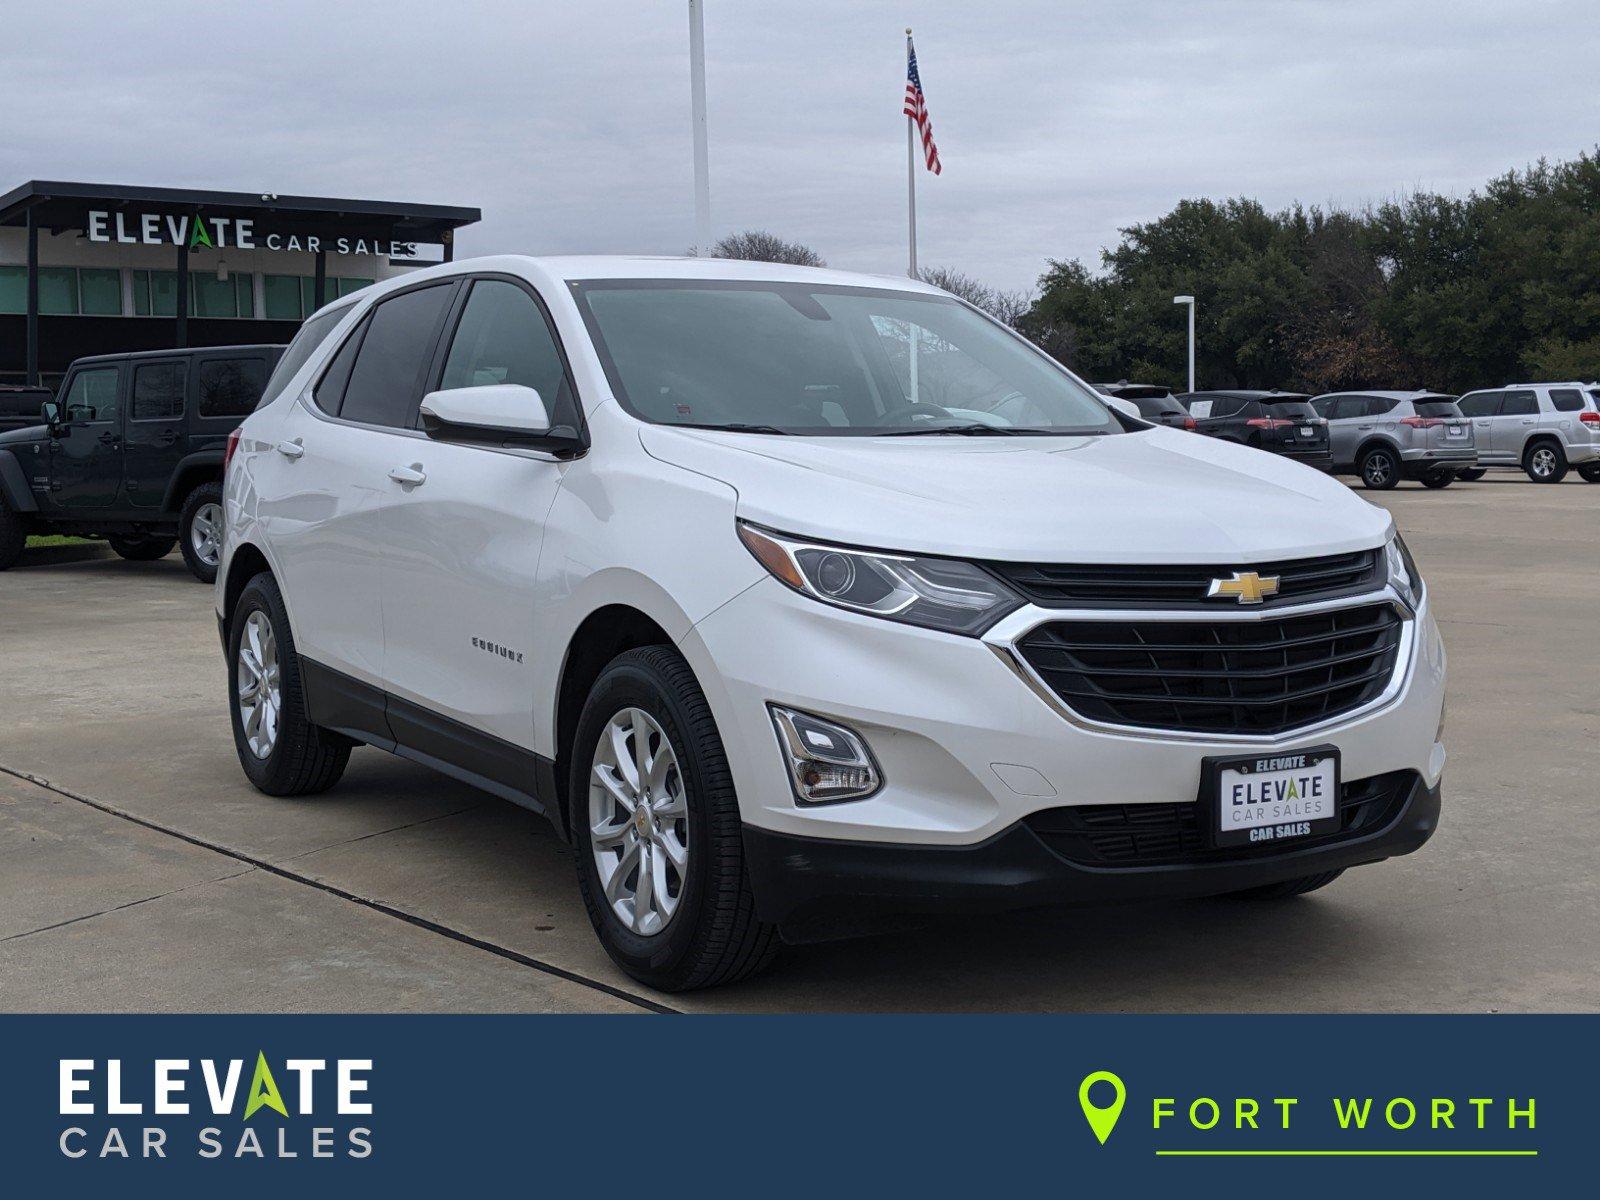 2019 Chevrolet Equinox FWD LT w/ 1LT image